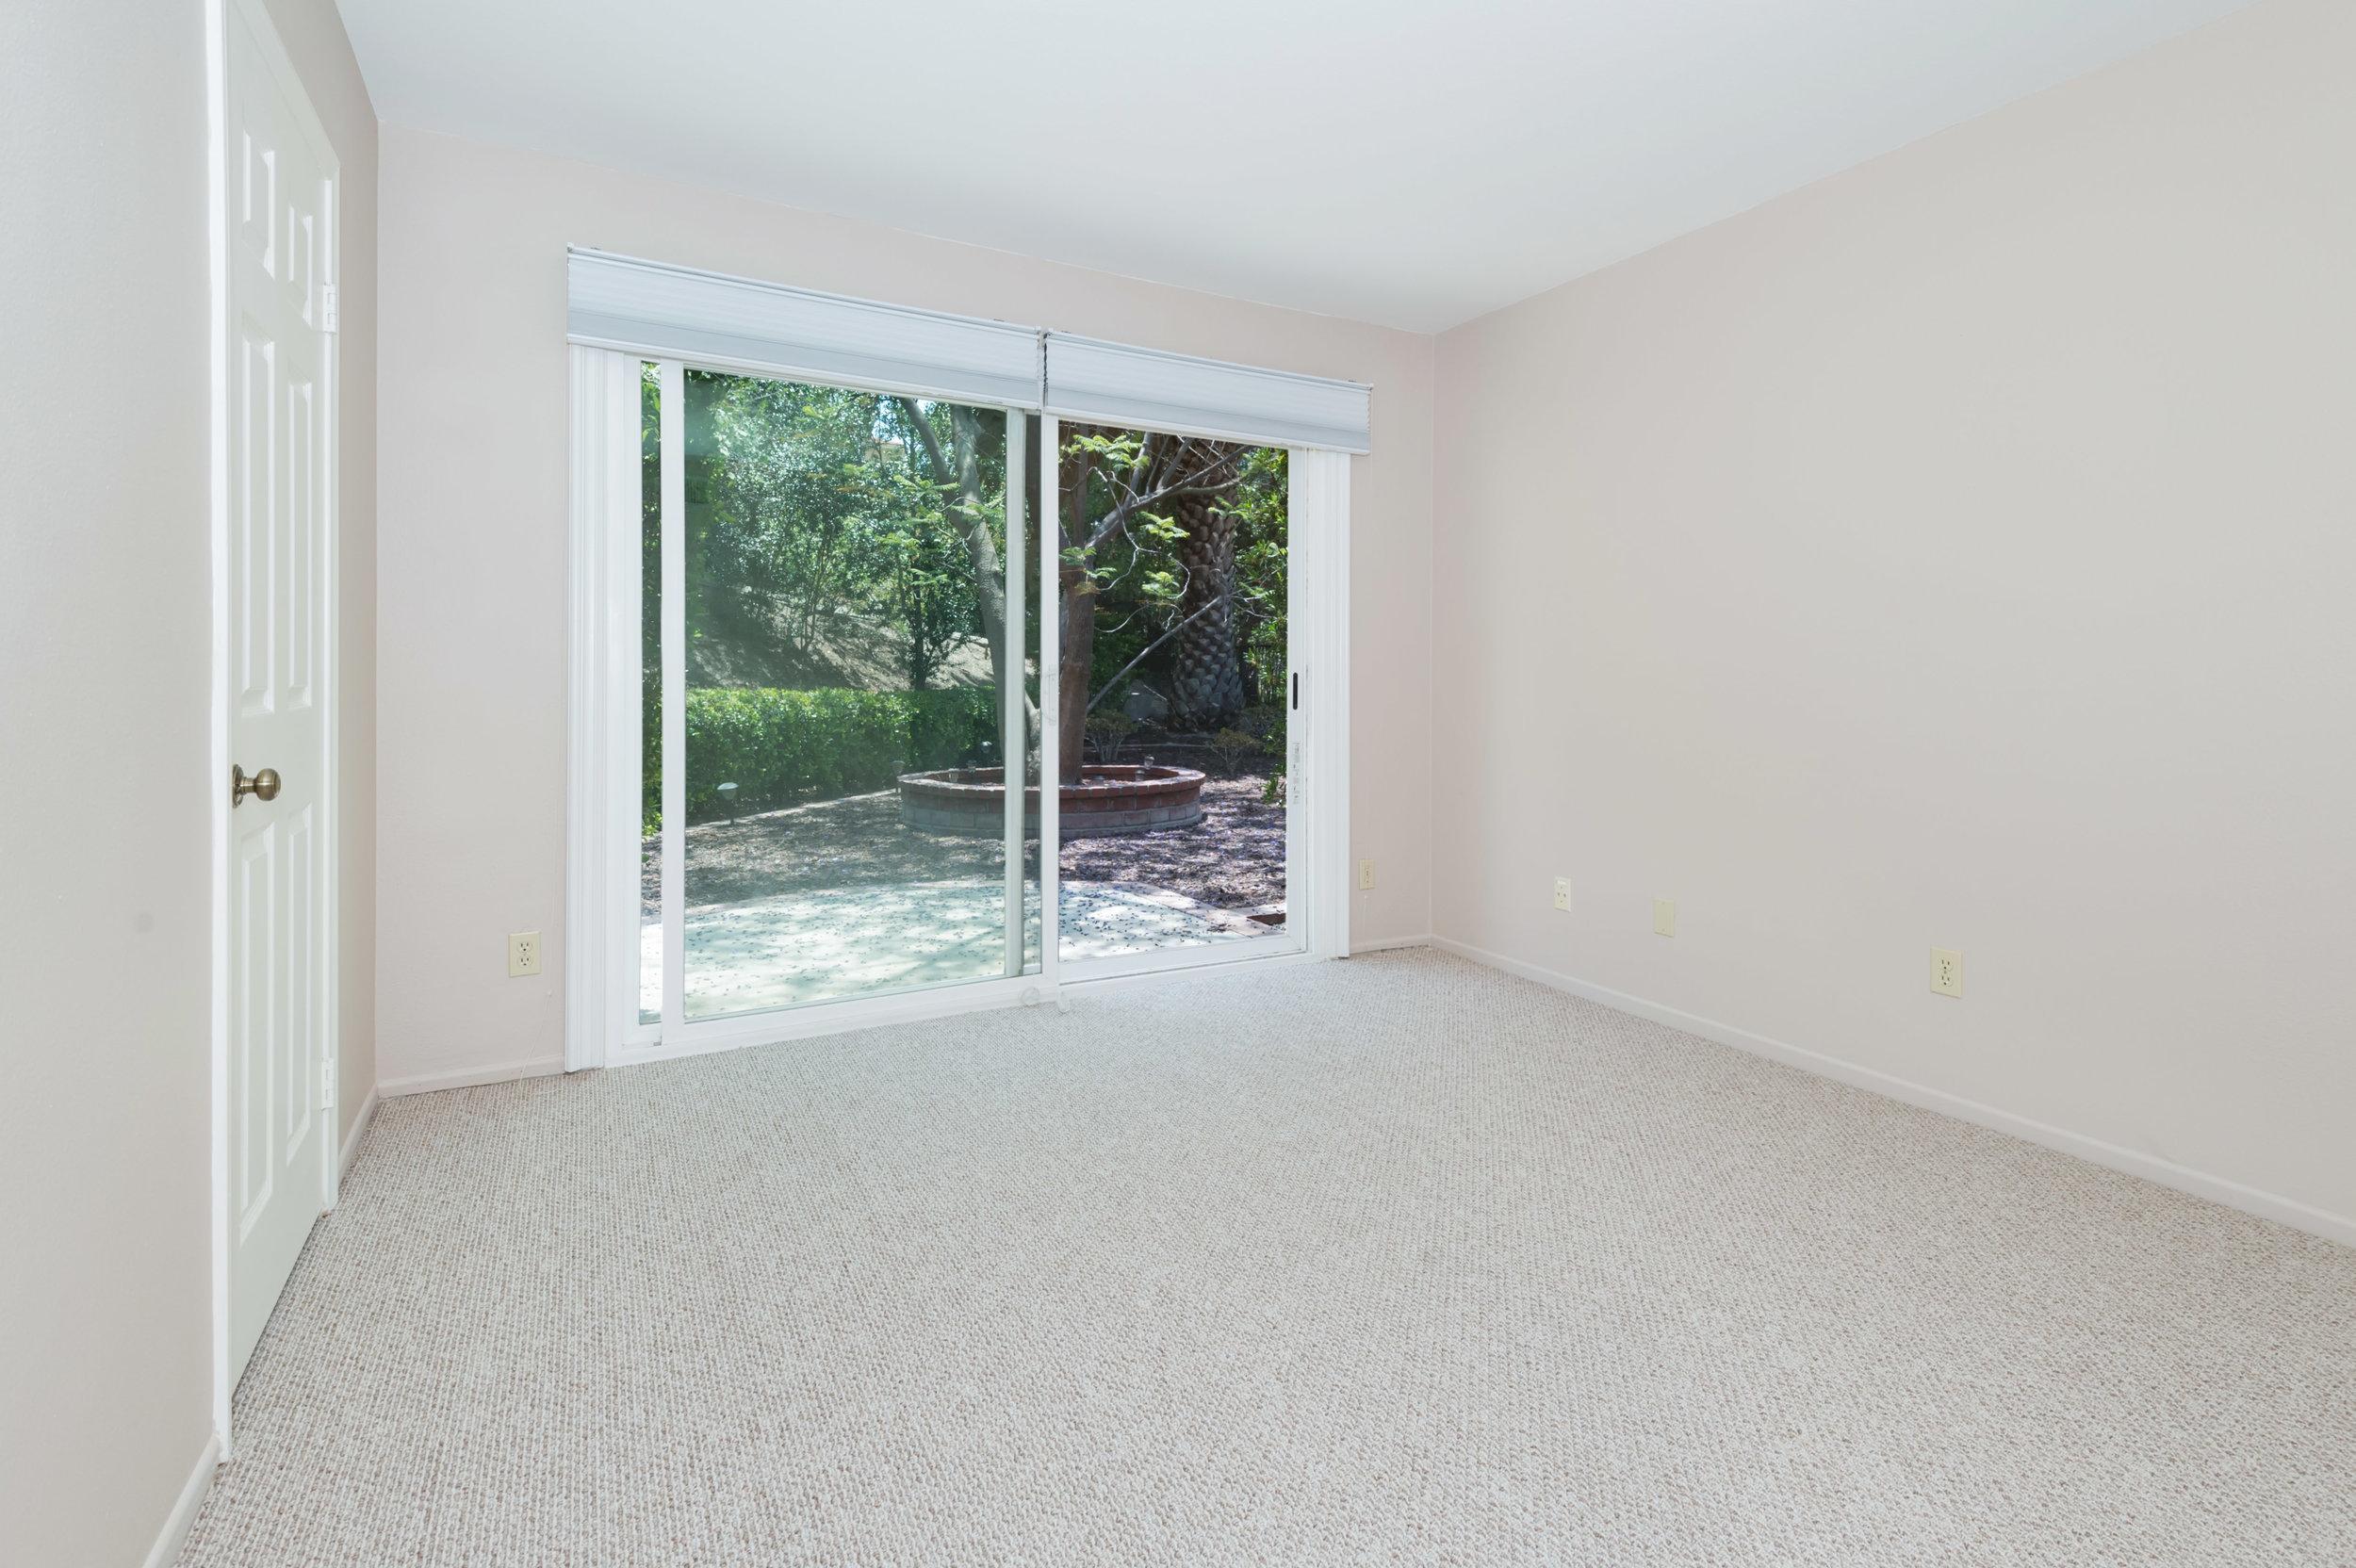 014 bedroom 8832 Moorcroft Avenue West Hills For Sale Lease The Malibu Life Team Luxury Real Estate.jpg